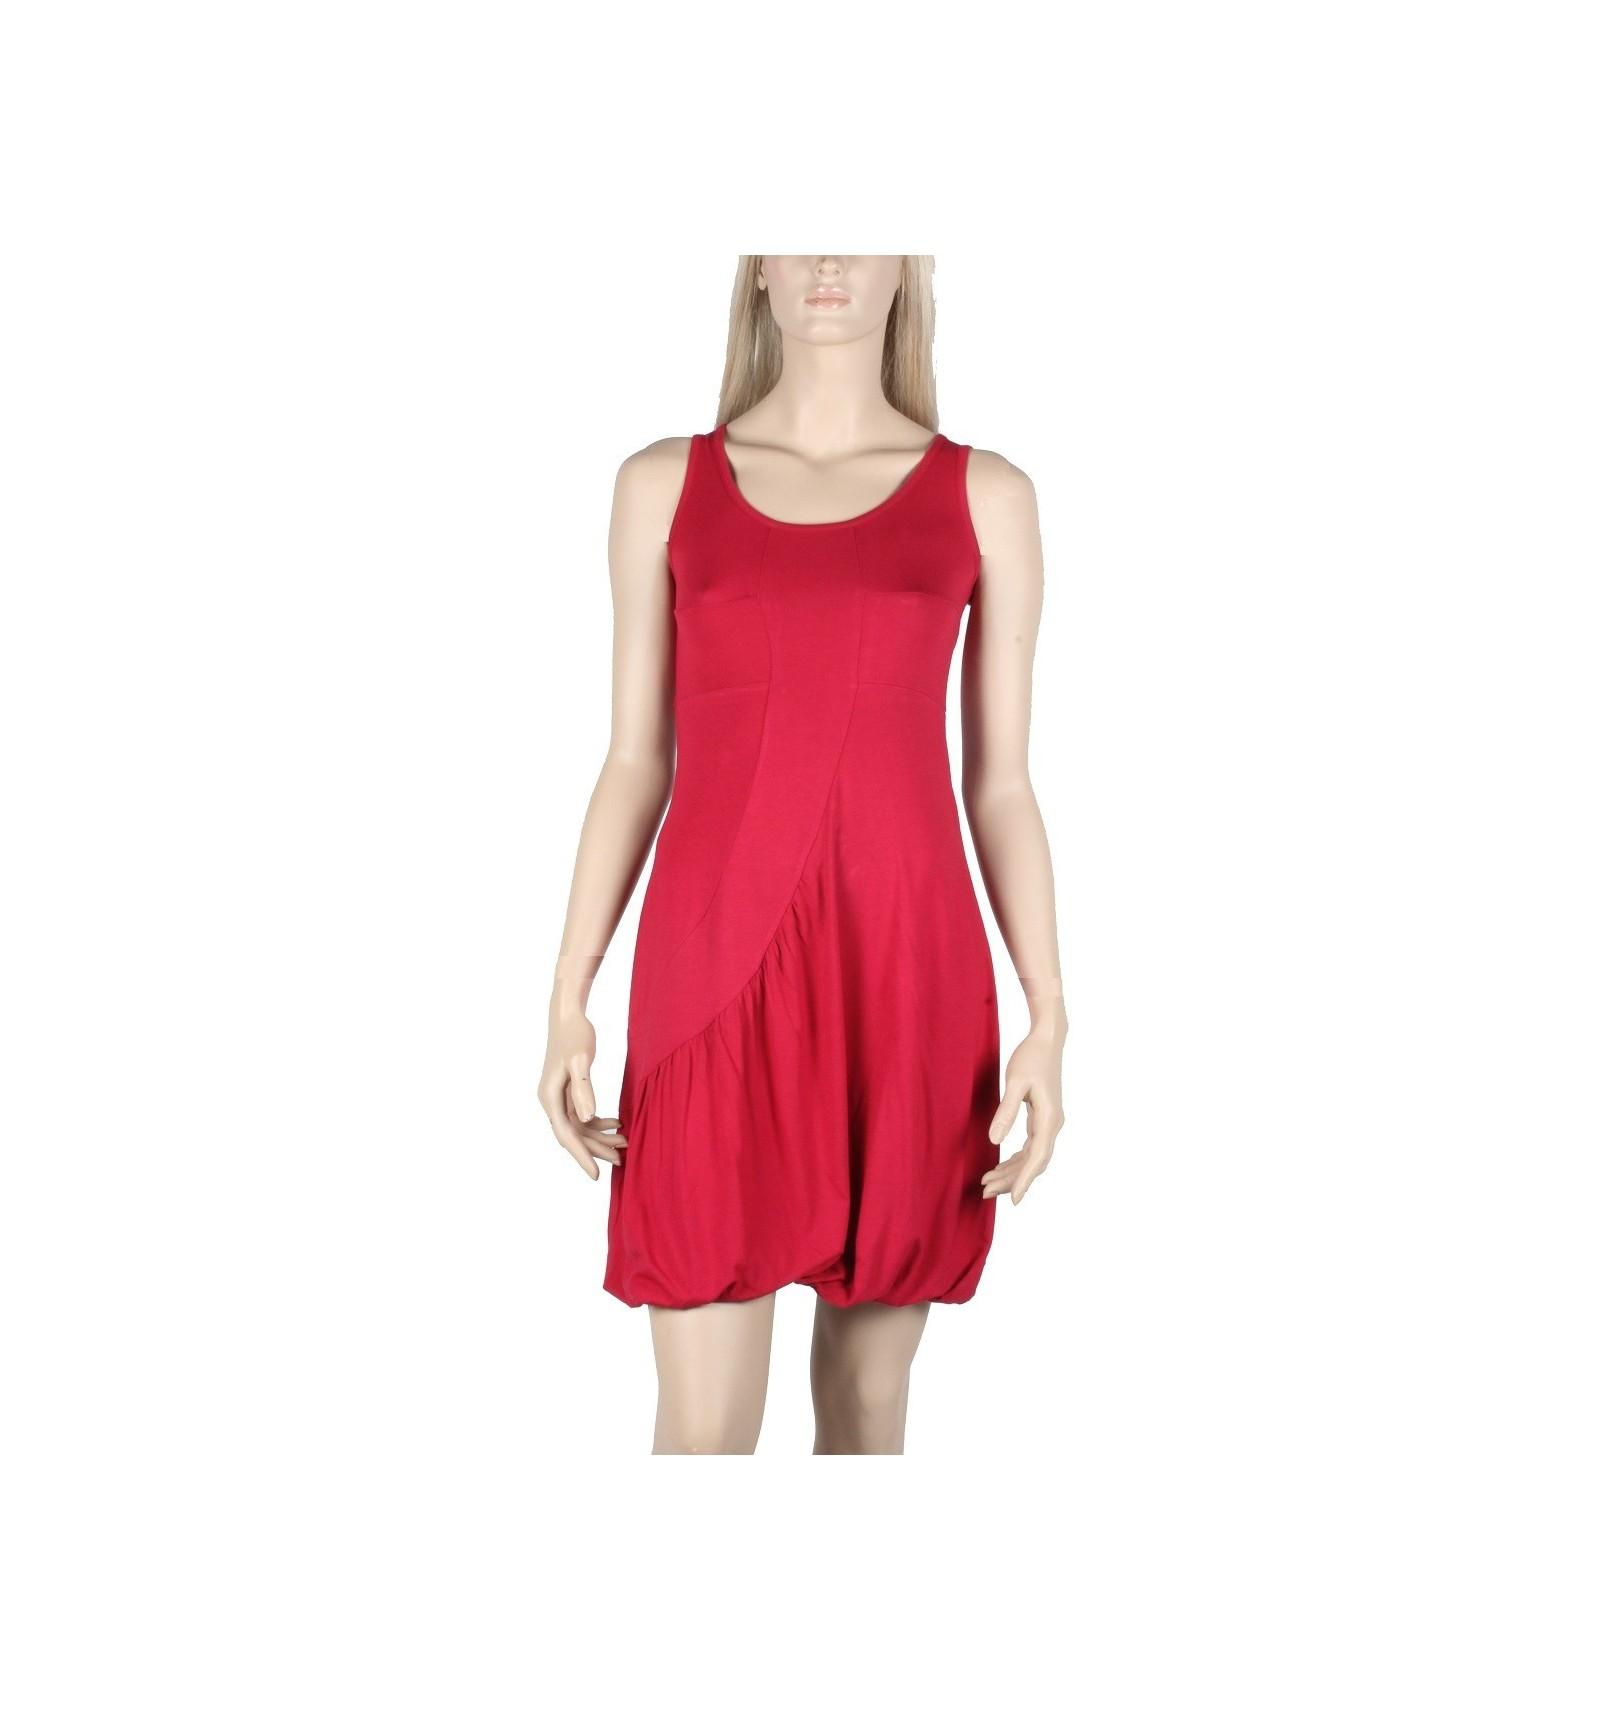 Natural cotton dress Maloka straspberry color \